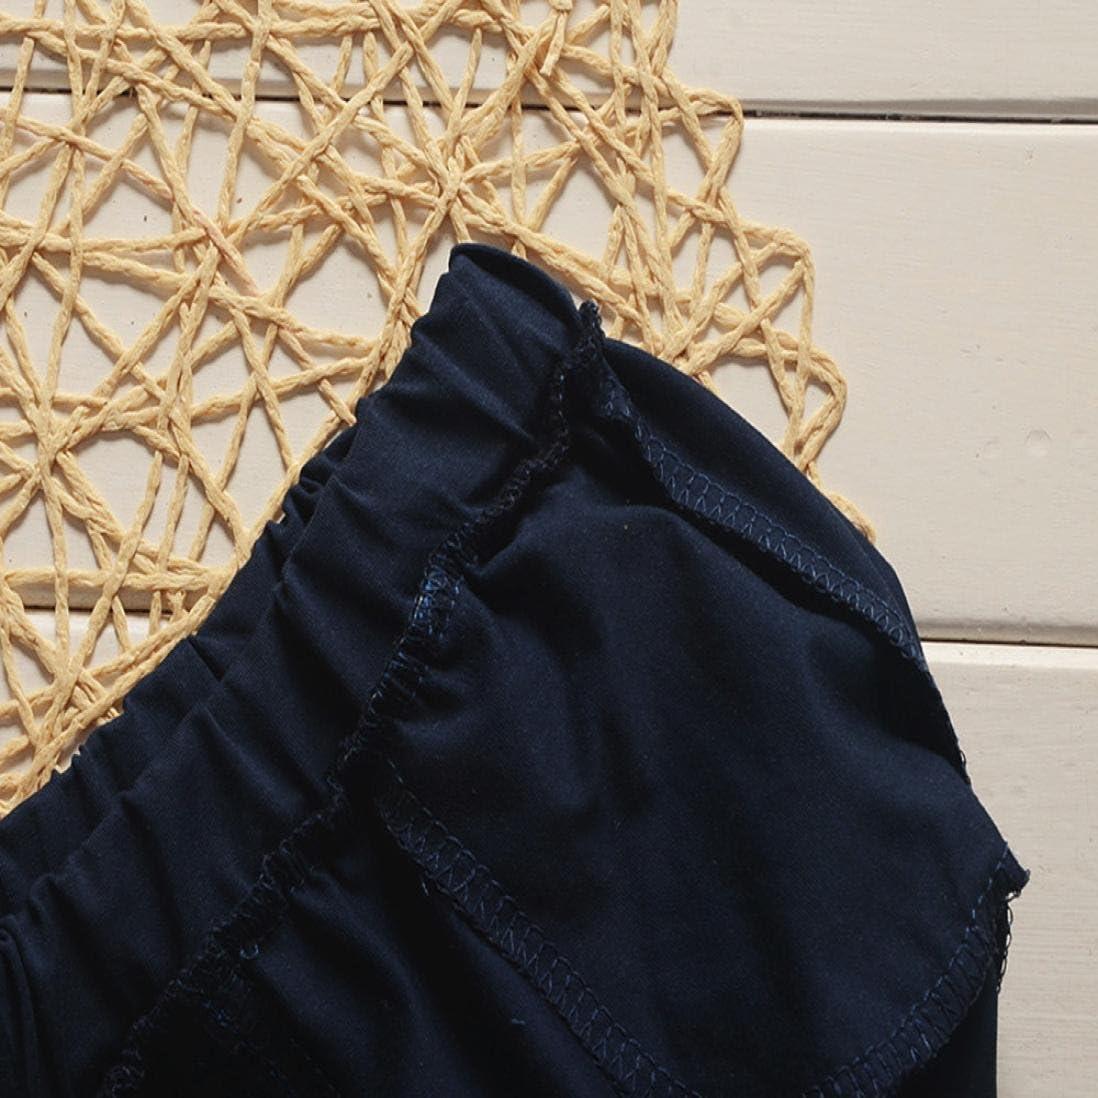 Gar/çon B/éb/é Ensembles 6~24 Mois LuckyGirls B/éb/é Gar/çons Barbe T-Shirt Tops Pantalons Courts Pantalons V/êtements de Mode-M/élange Coton